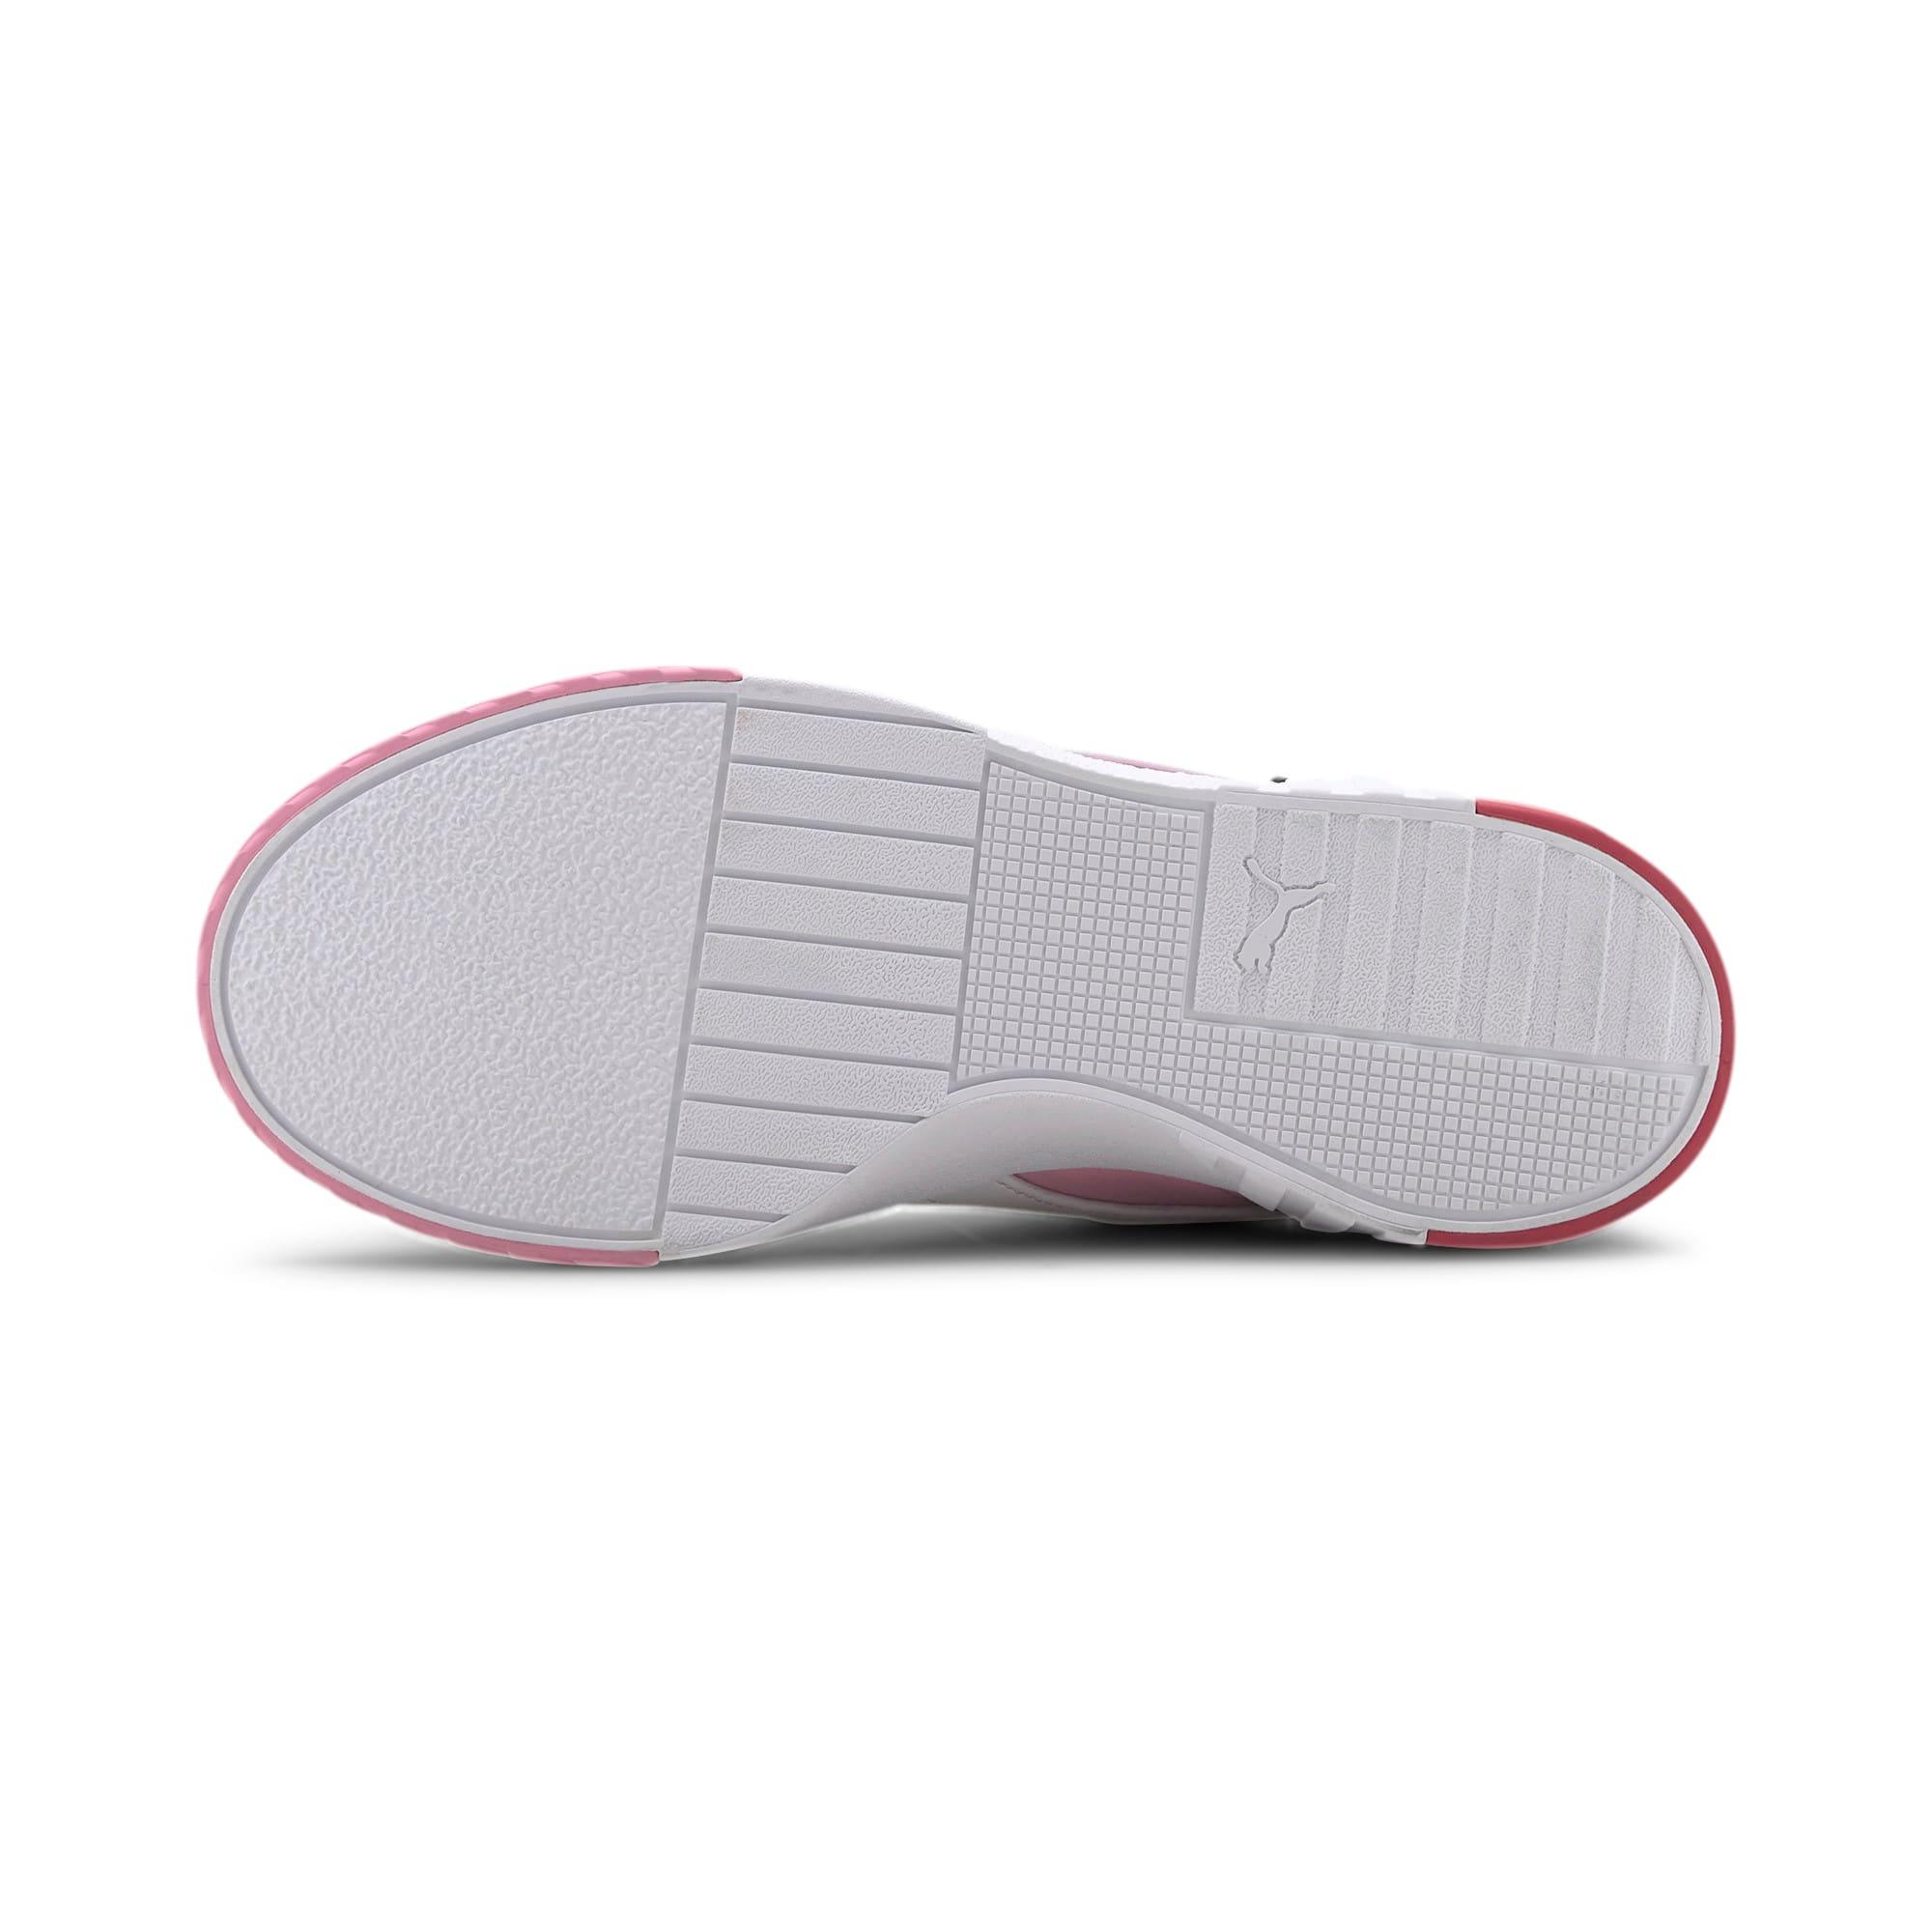 Thumbnail 5 of PUMA x KARL LAGERFELD Cali Women's Training Shoes, Puma White-PRISM PINK, medium